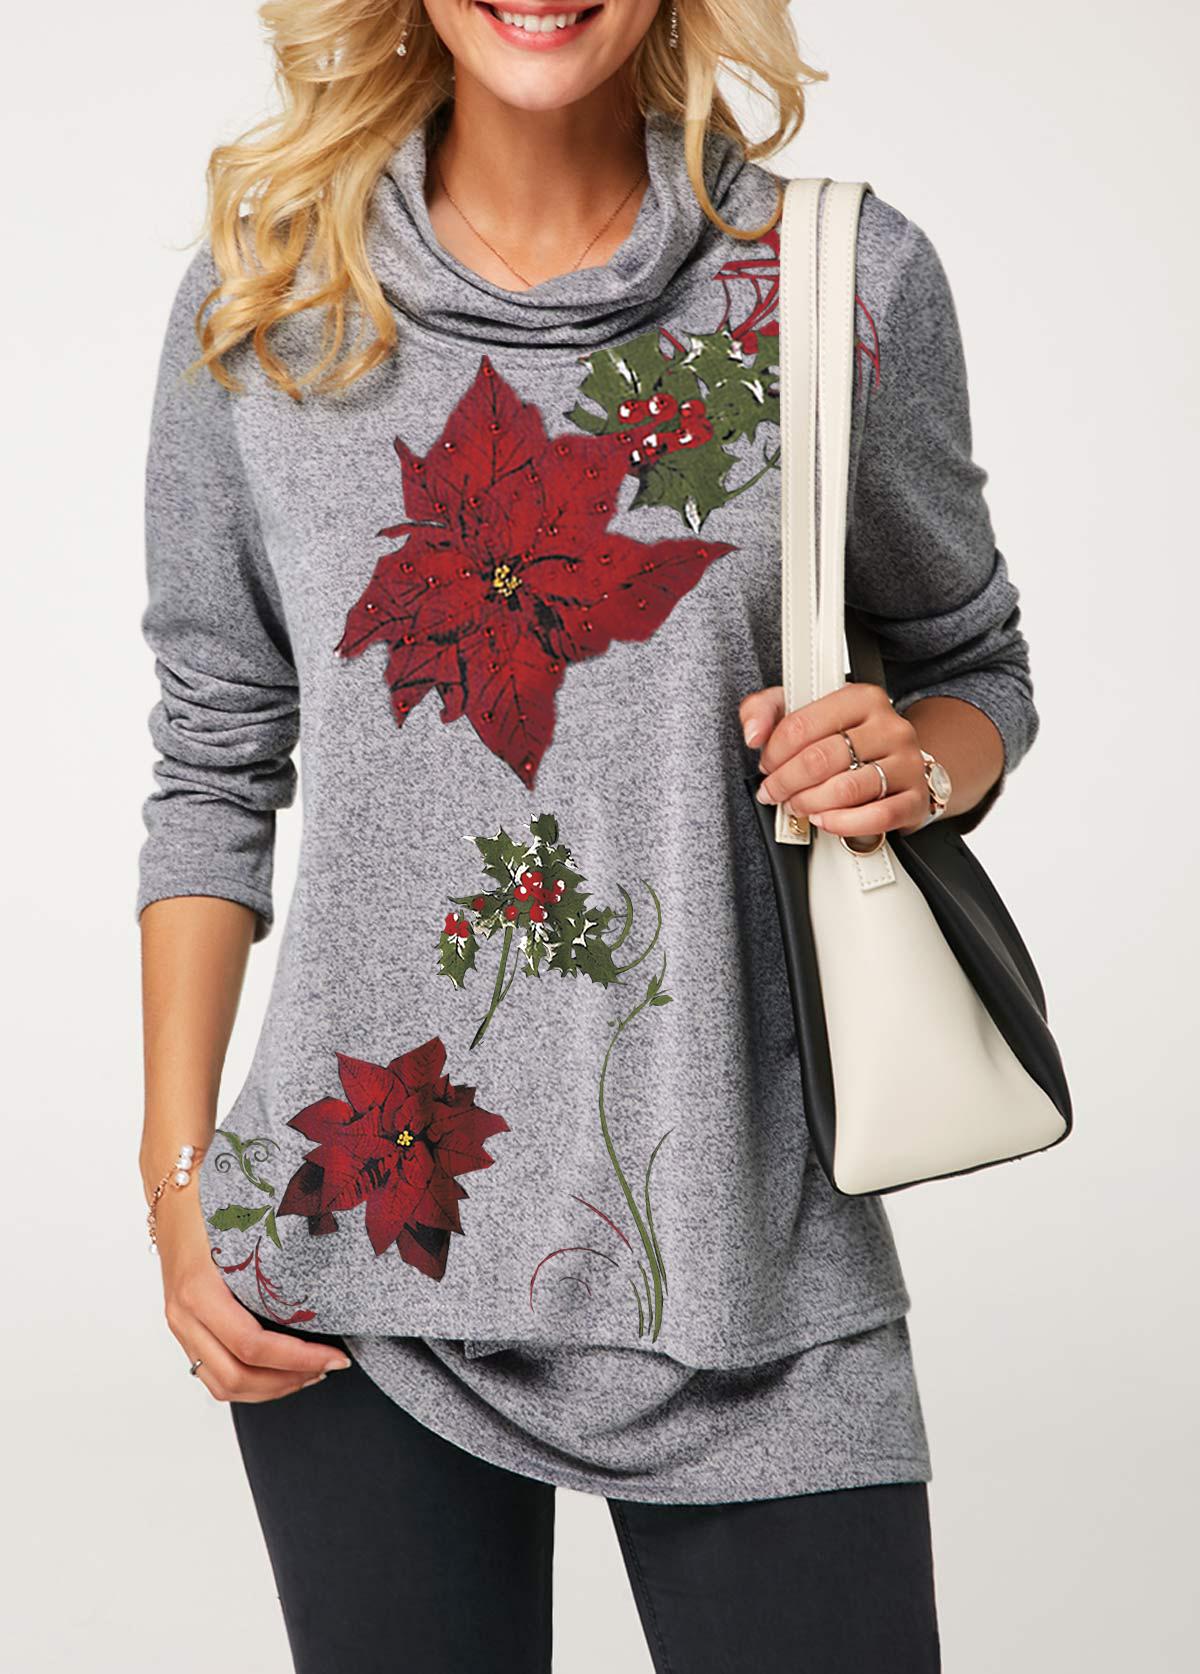 Cowl Neck Flower Print Layered Christmas T Shirt